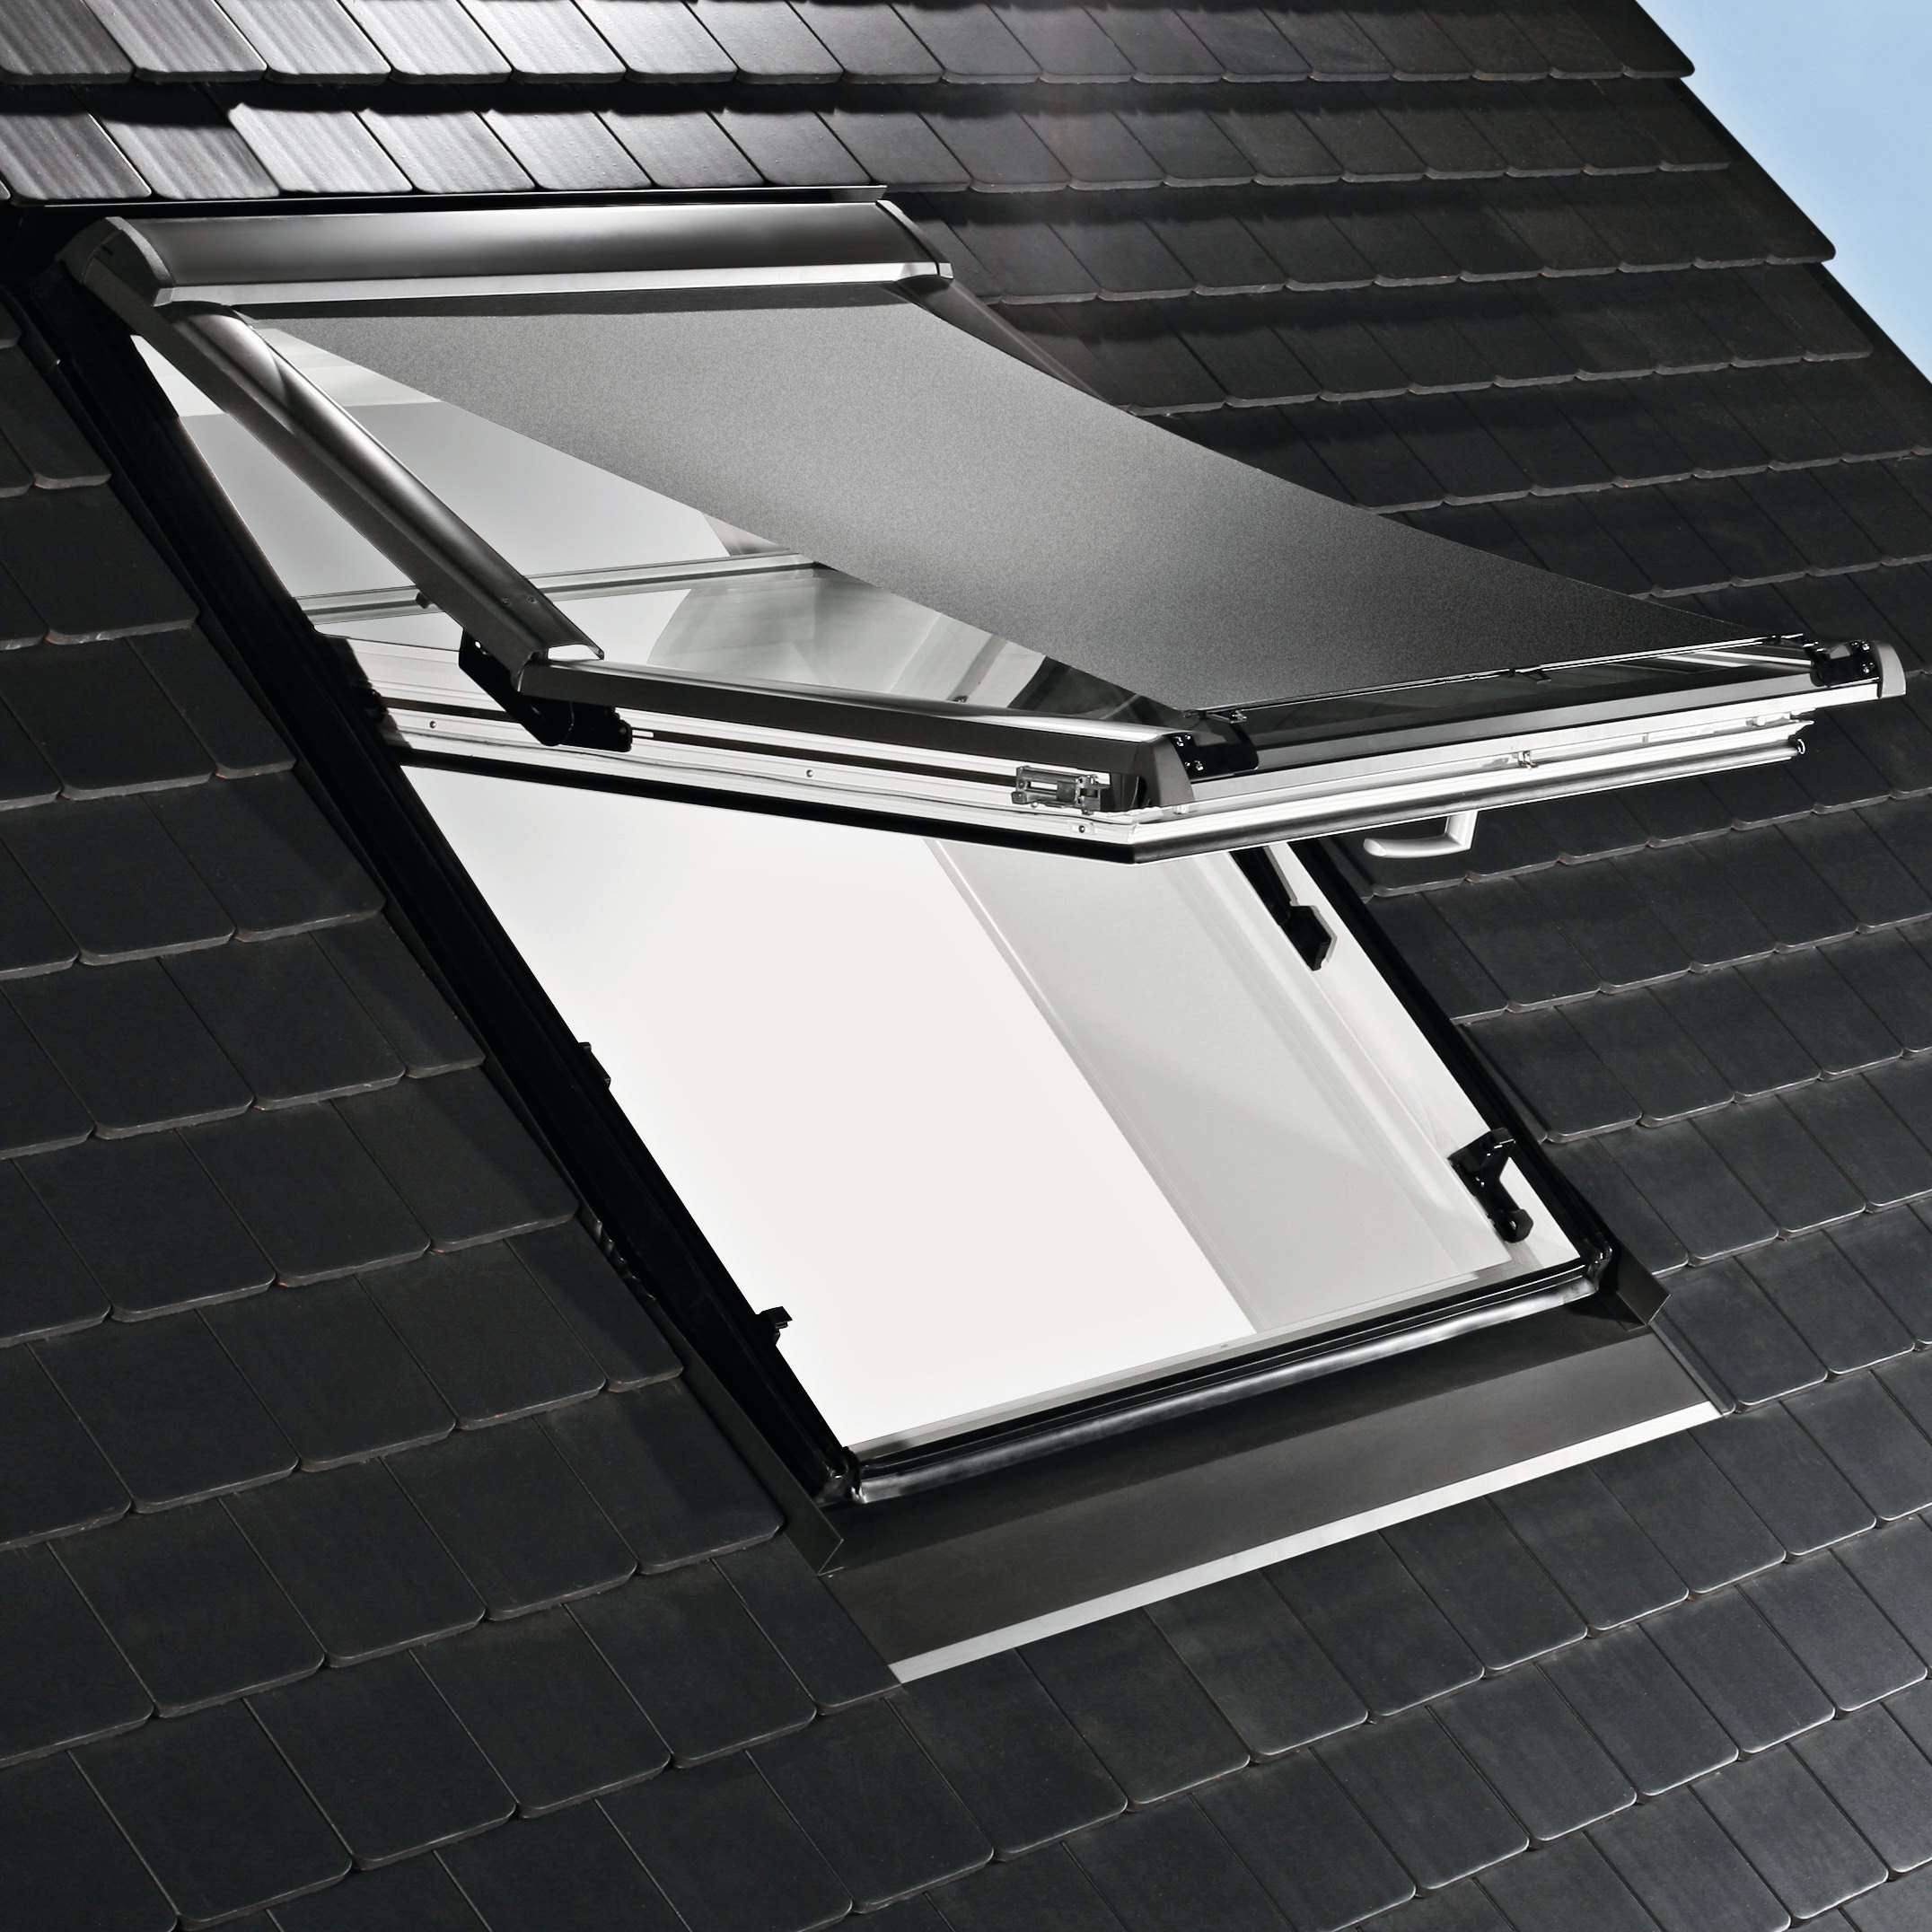 roto zar m r6/r8 hitzeschutz-markise screen manuell grau